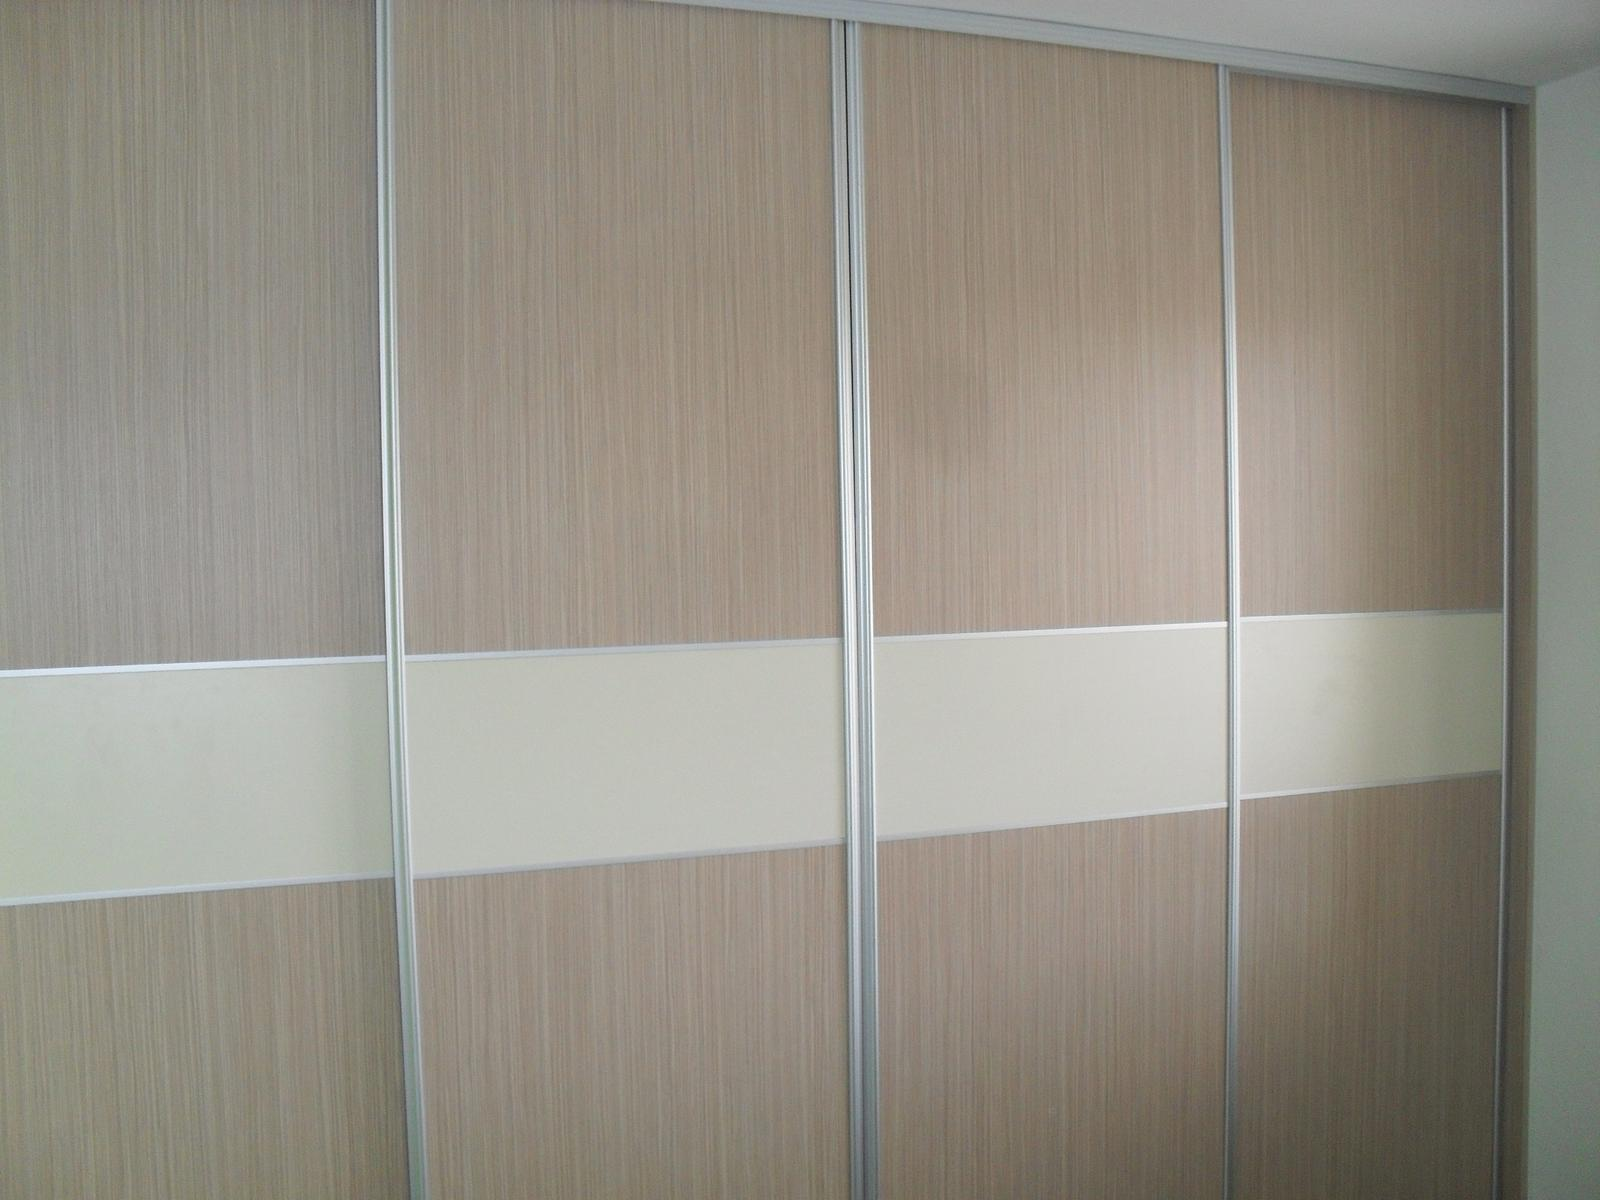 Vstavané skrine Martin Benko Bošany - Obrázok č. 48